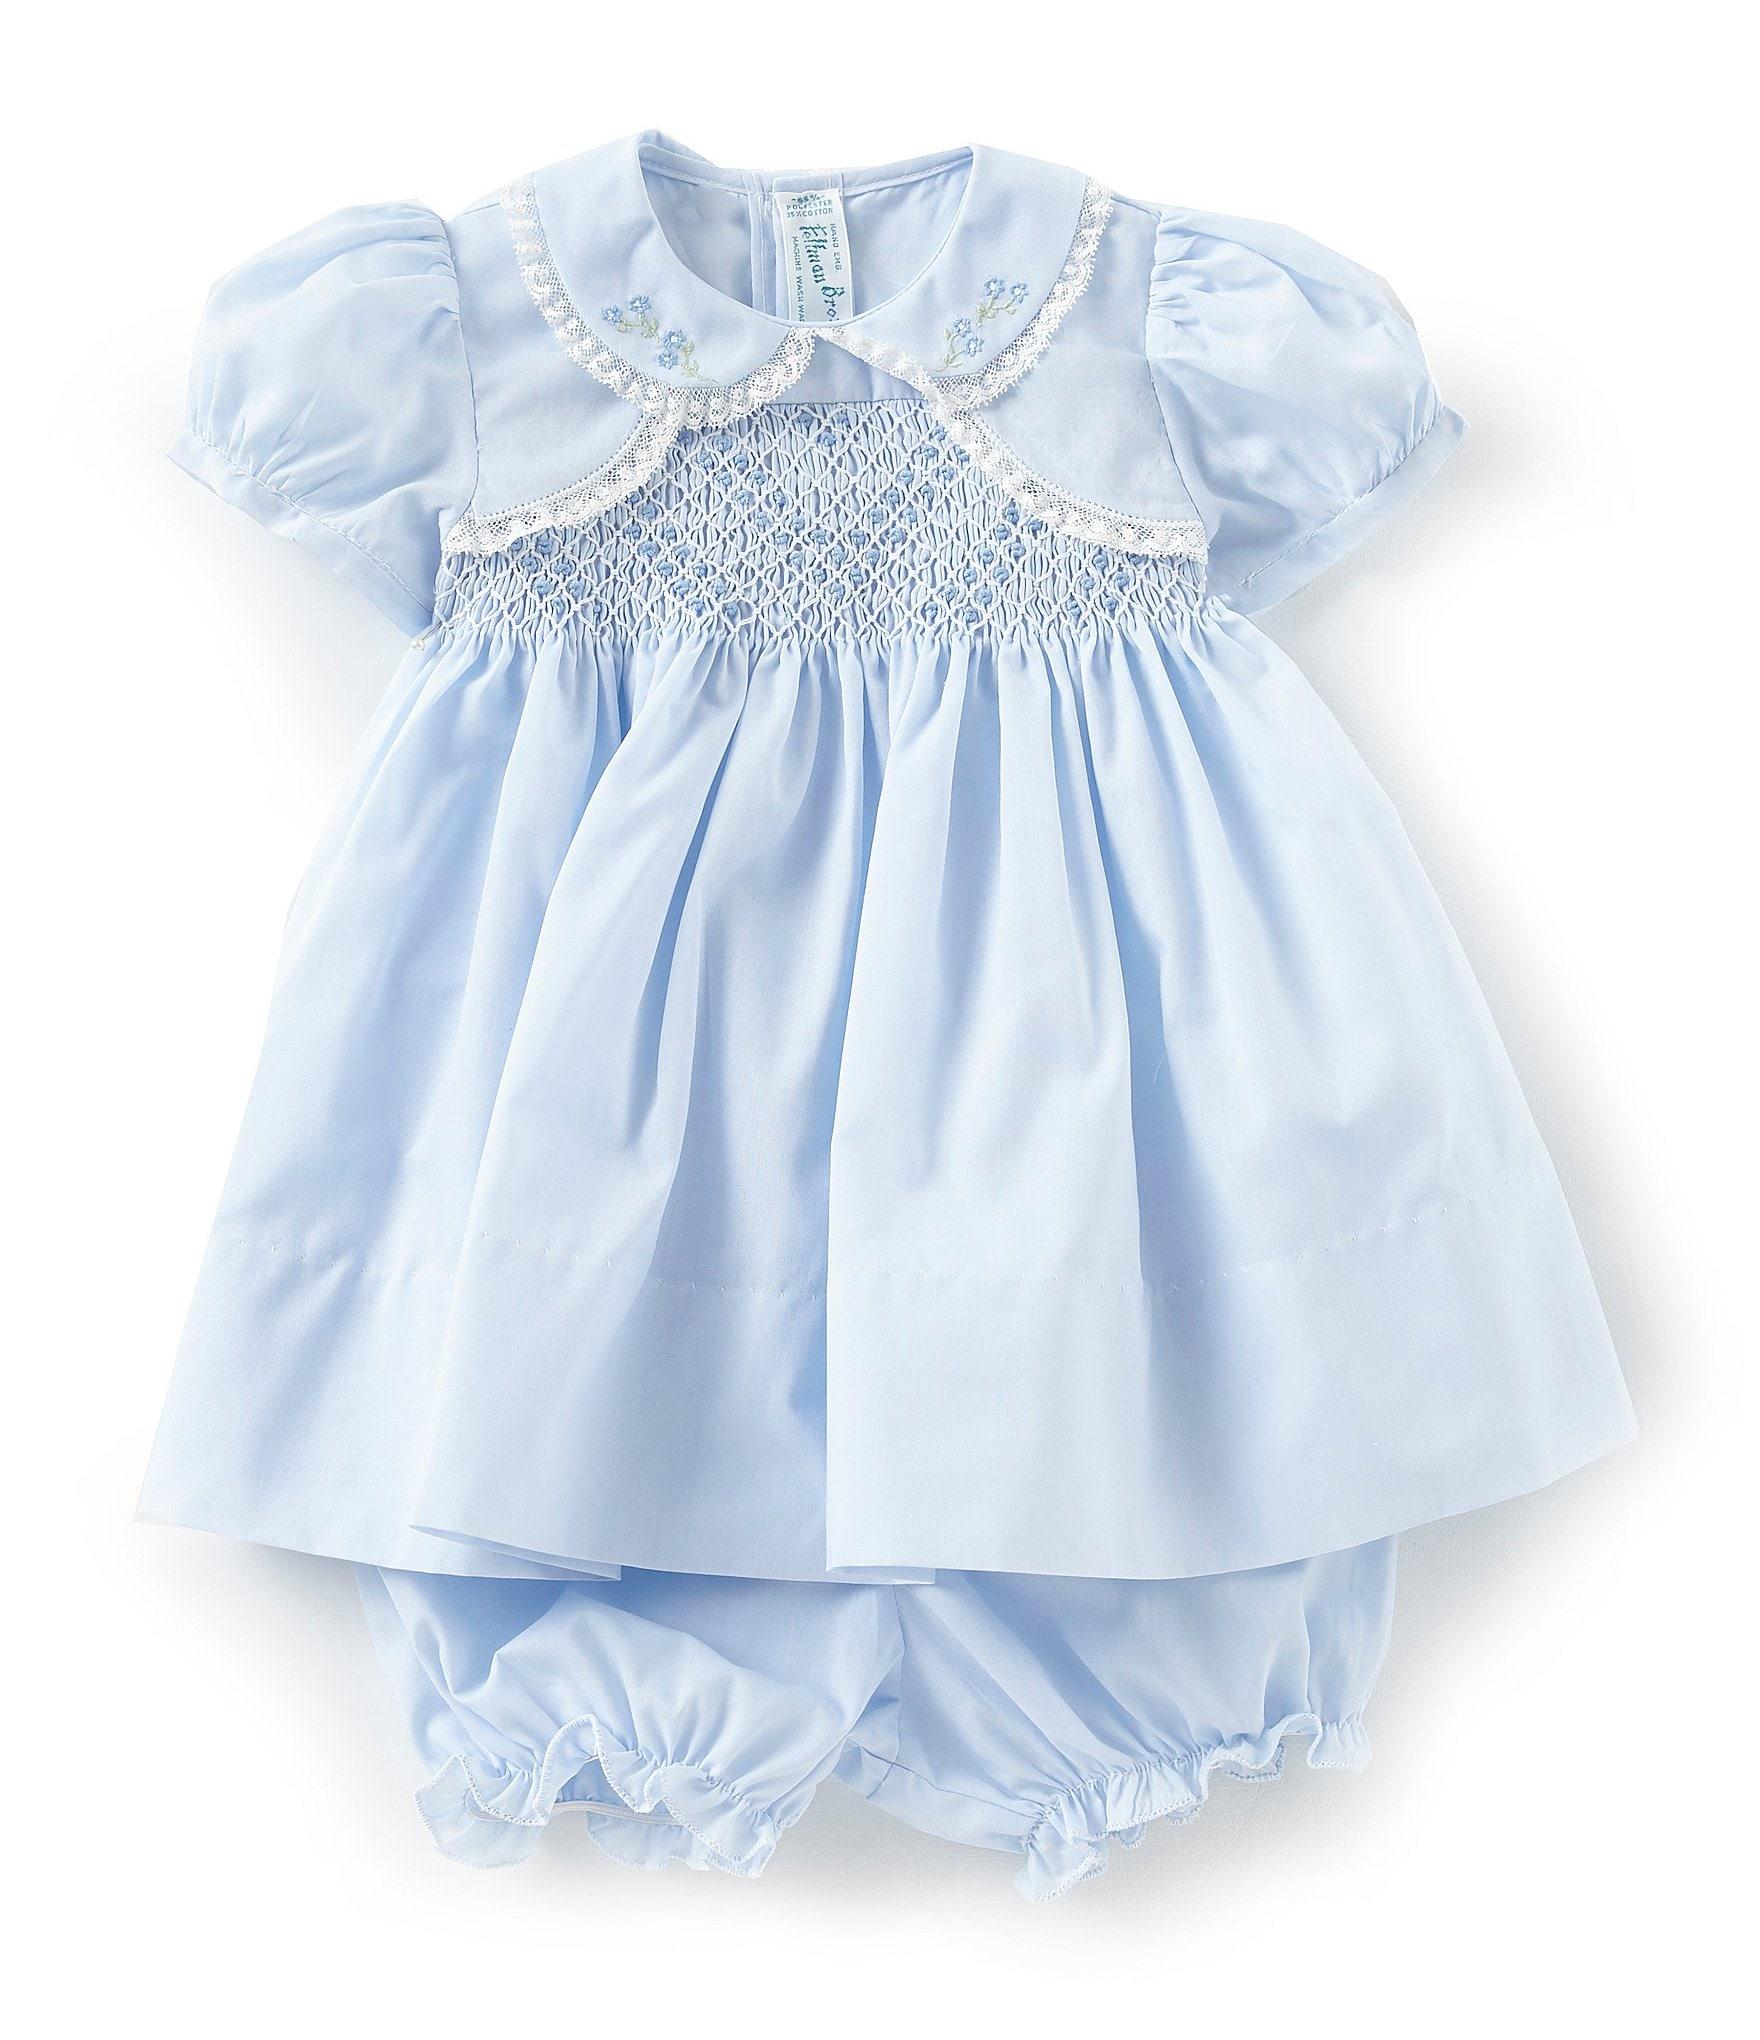 007e1953241d Feltman Brothers Baby Girl Clothing | Dillard's